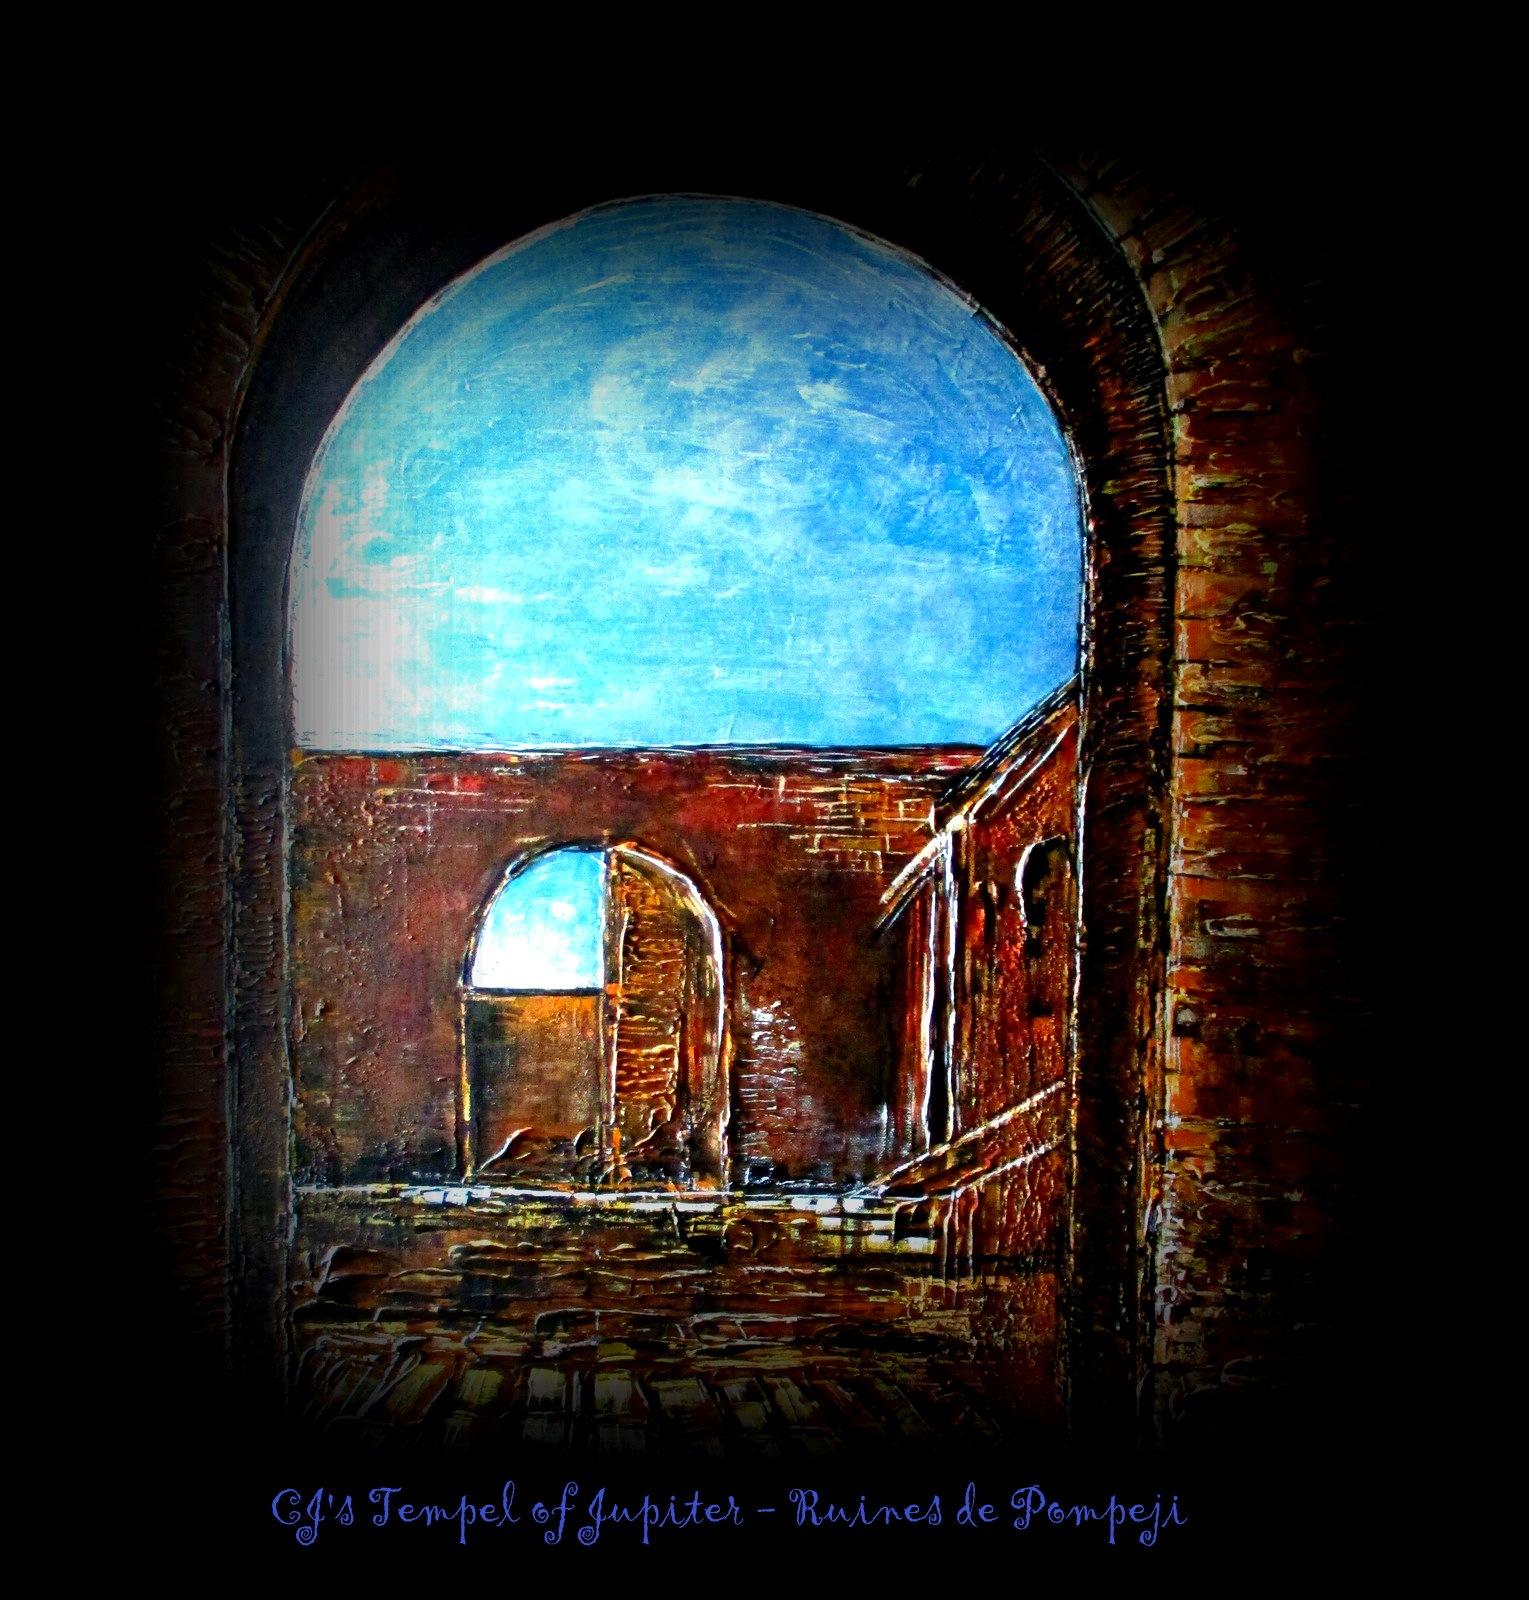 CJ's Tempel of Jupiter - Ruines de Pompeji  by cathyjansen